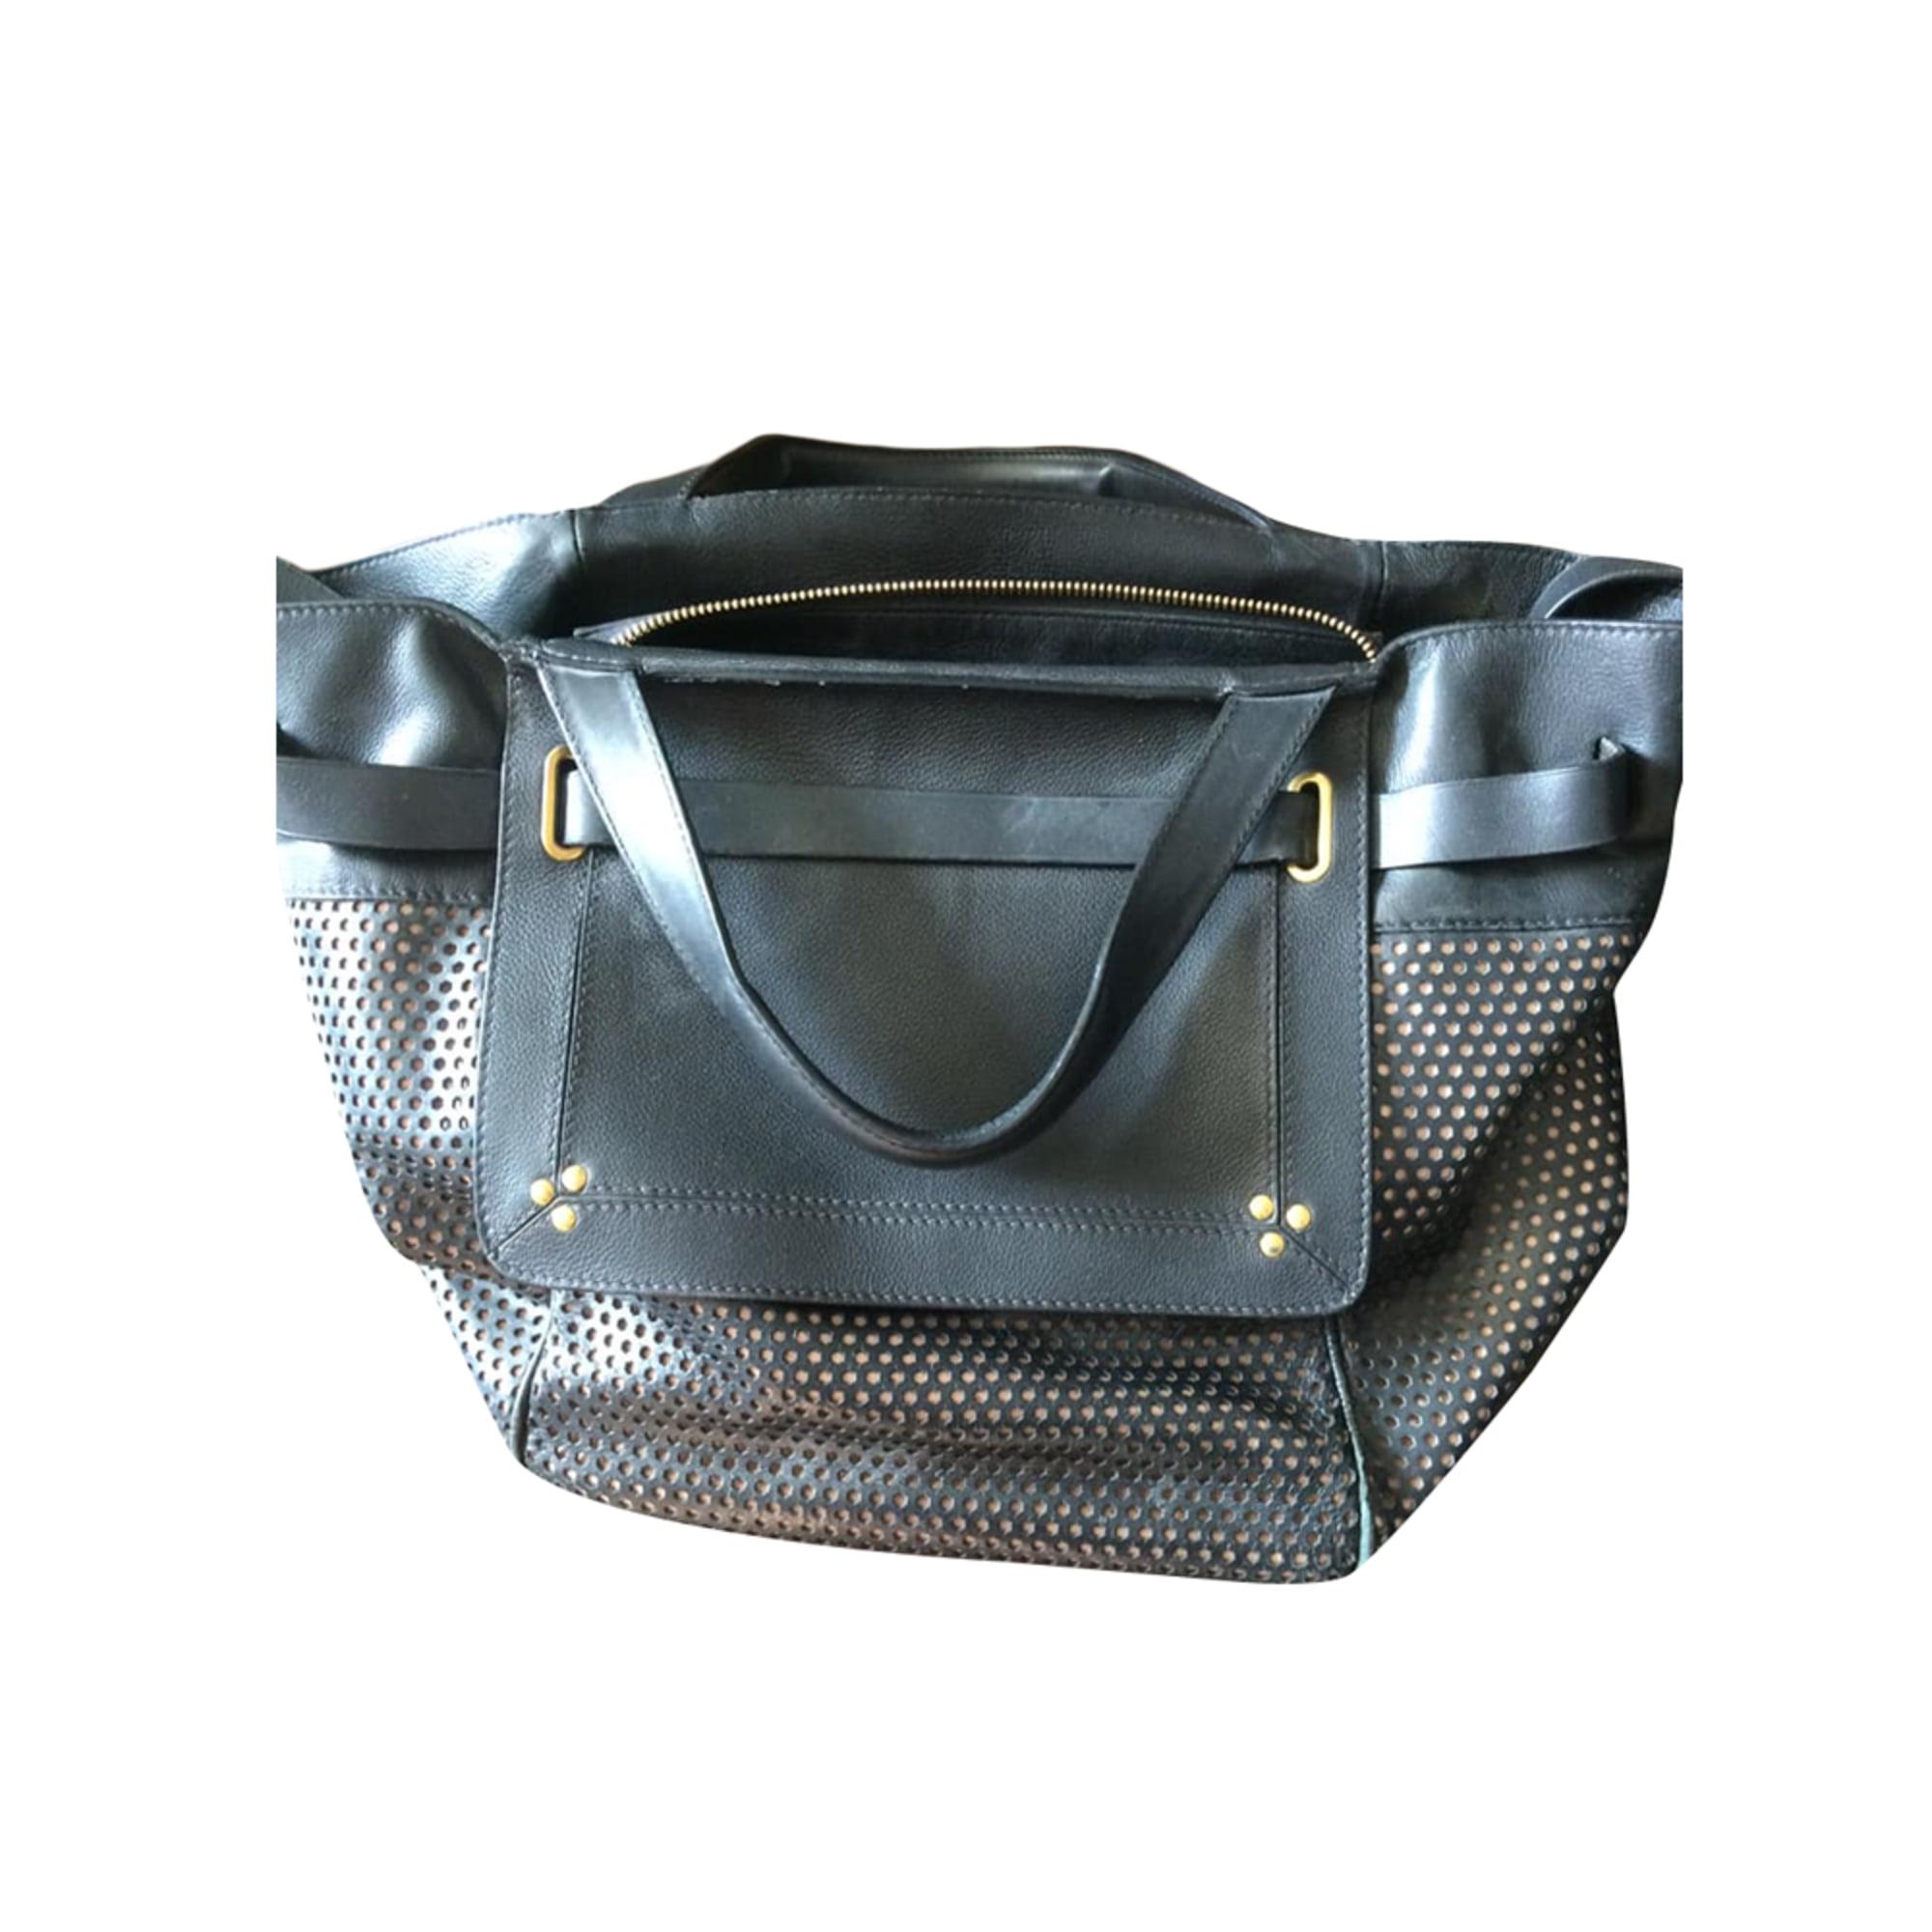 Leather Handbag JEROME DREYFUSS Black